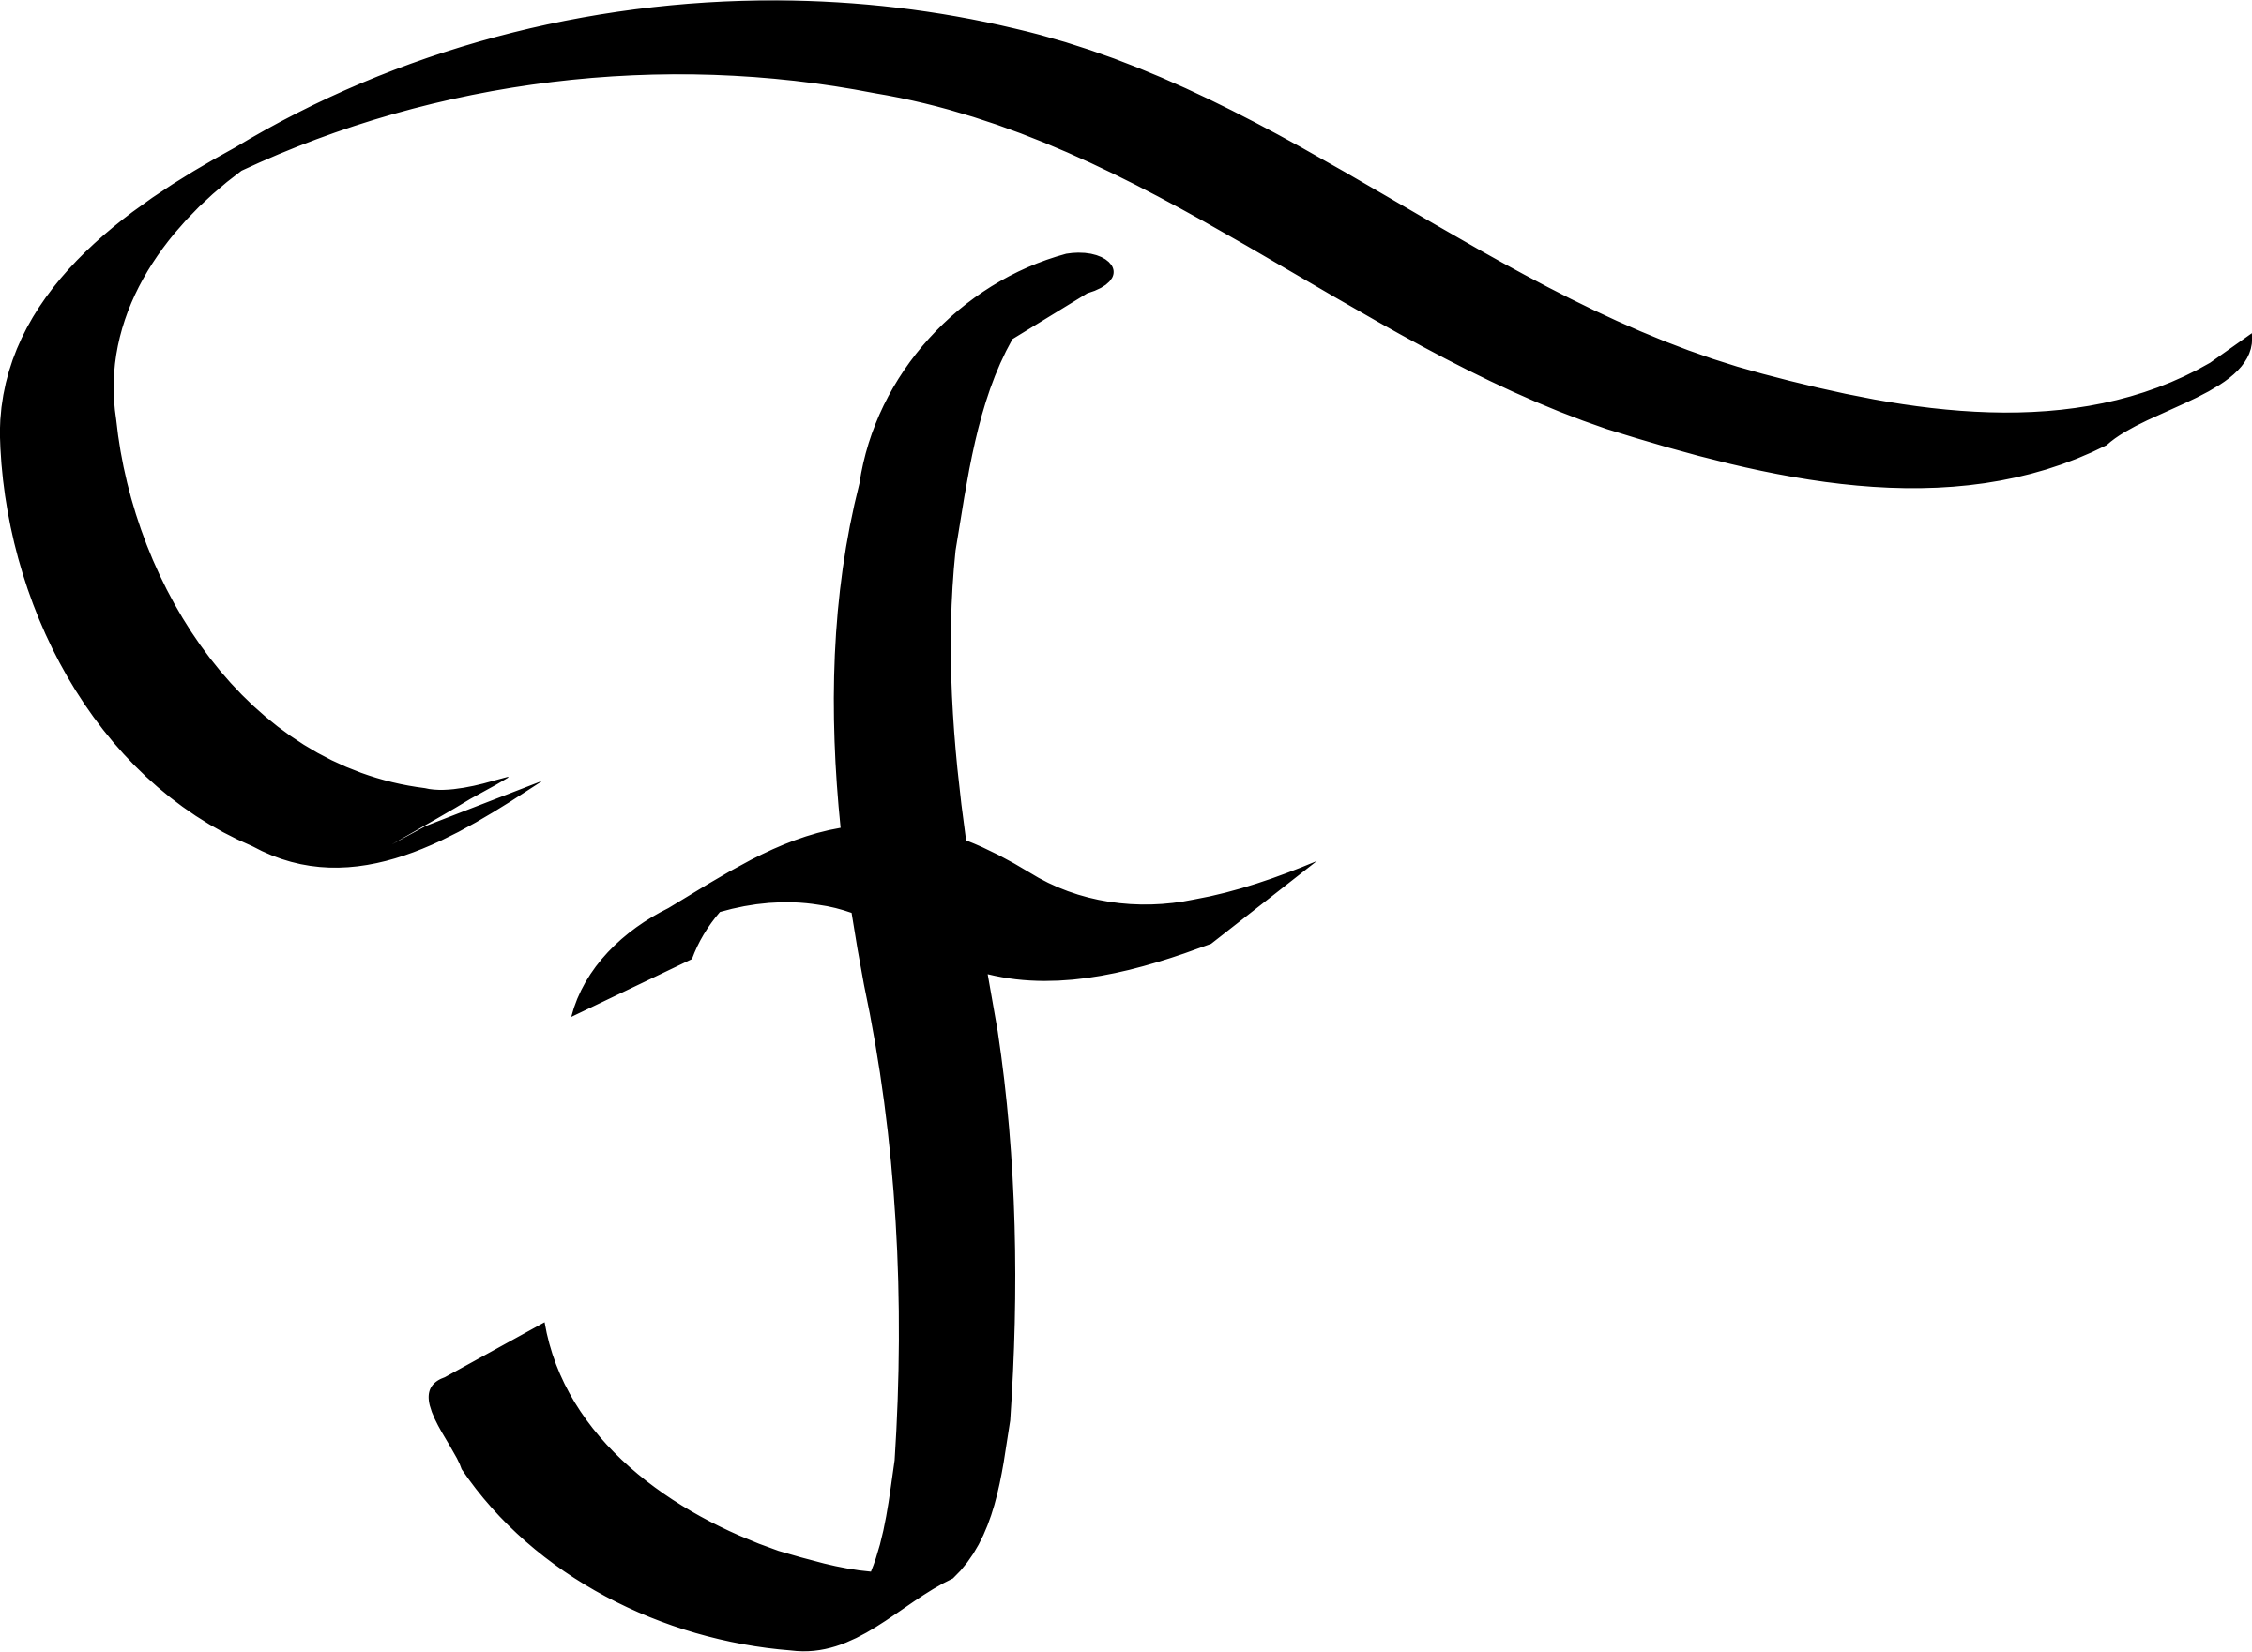 Clipart Capital F